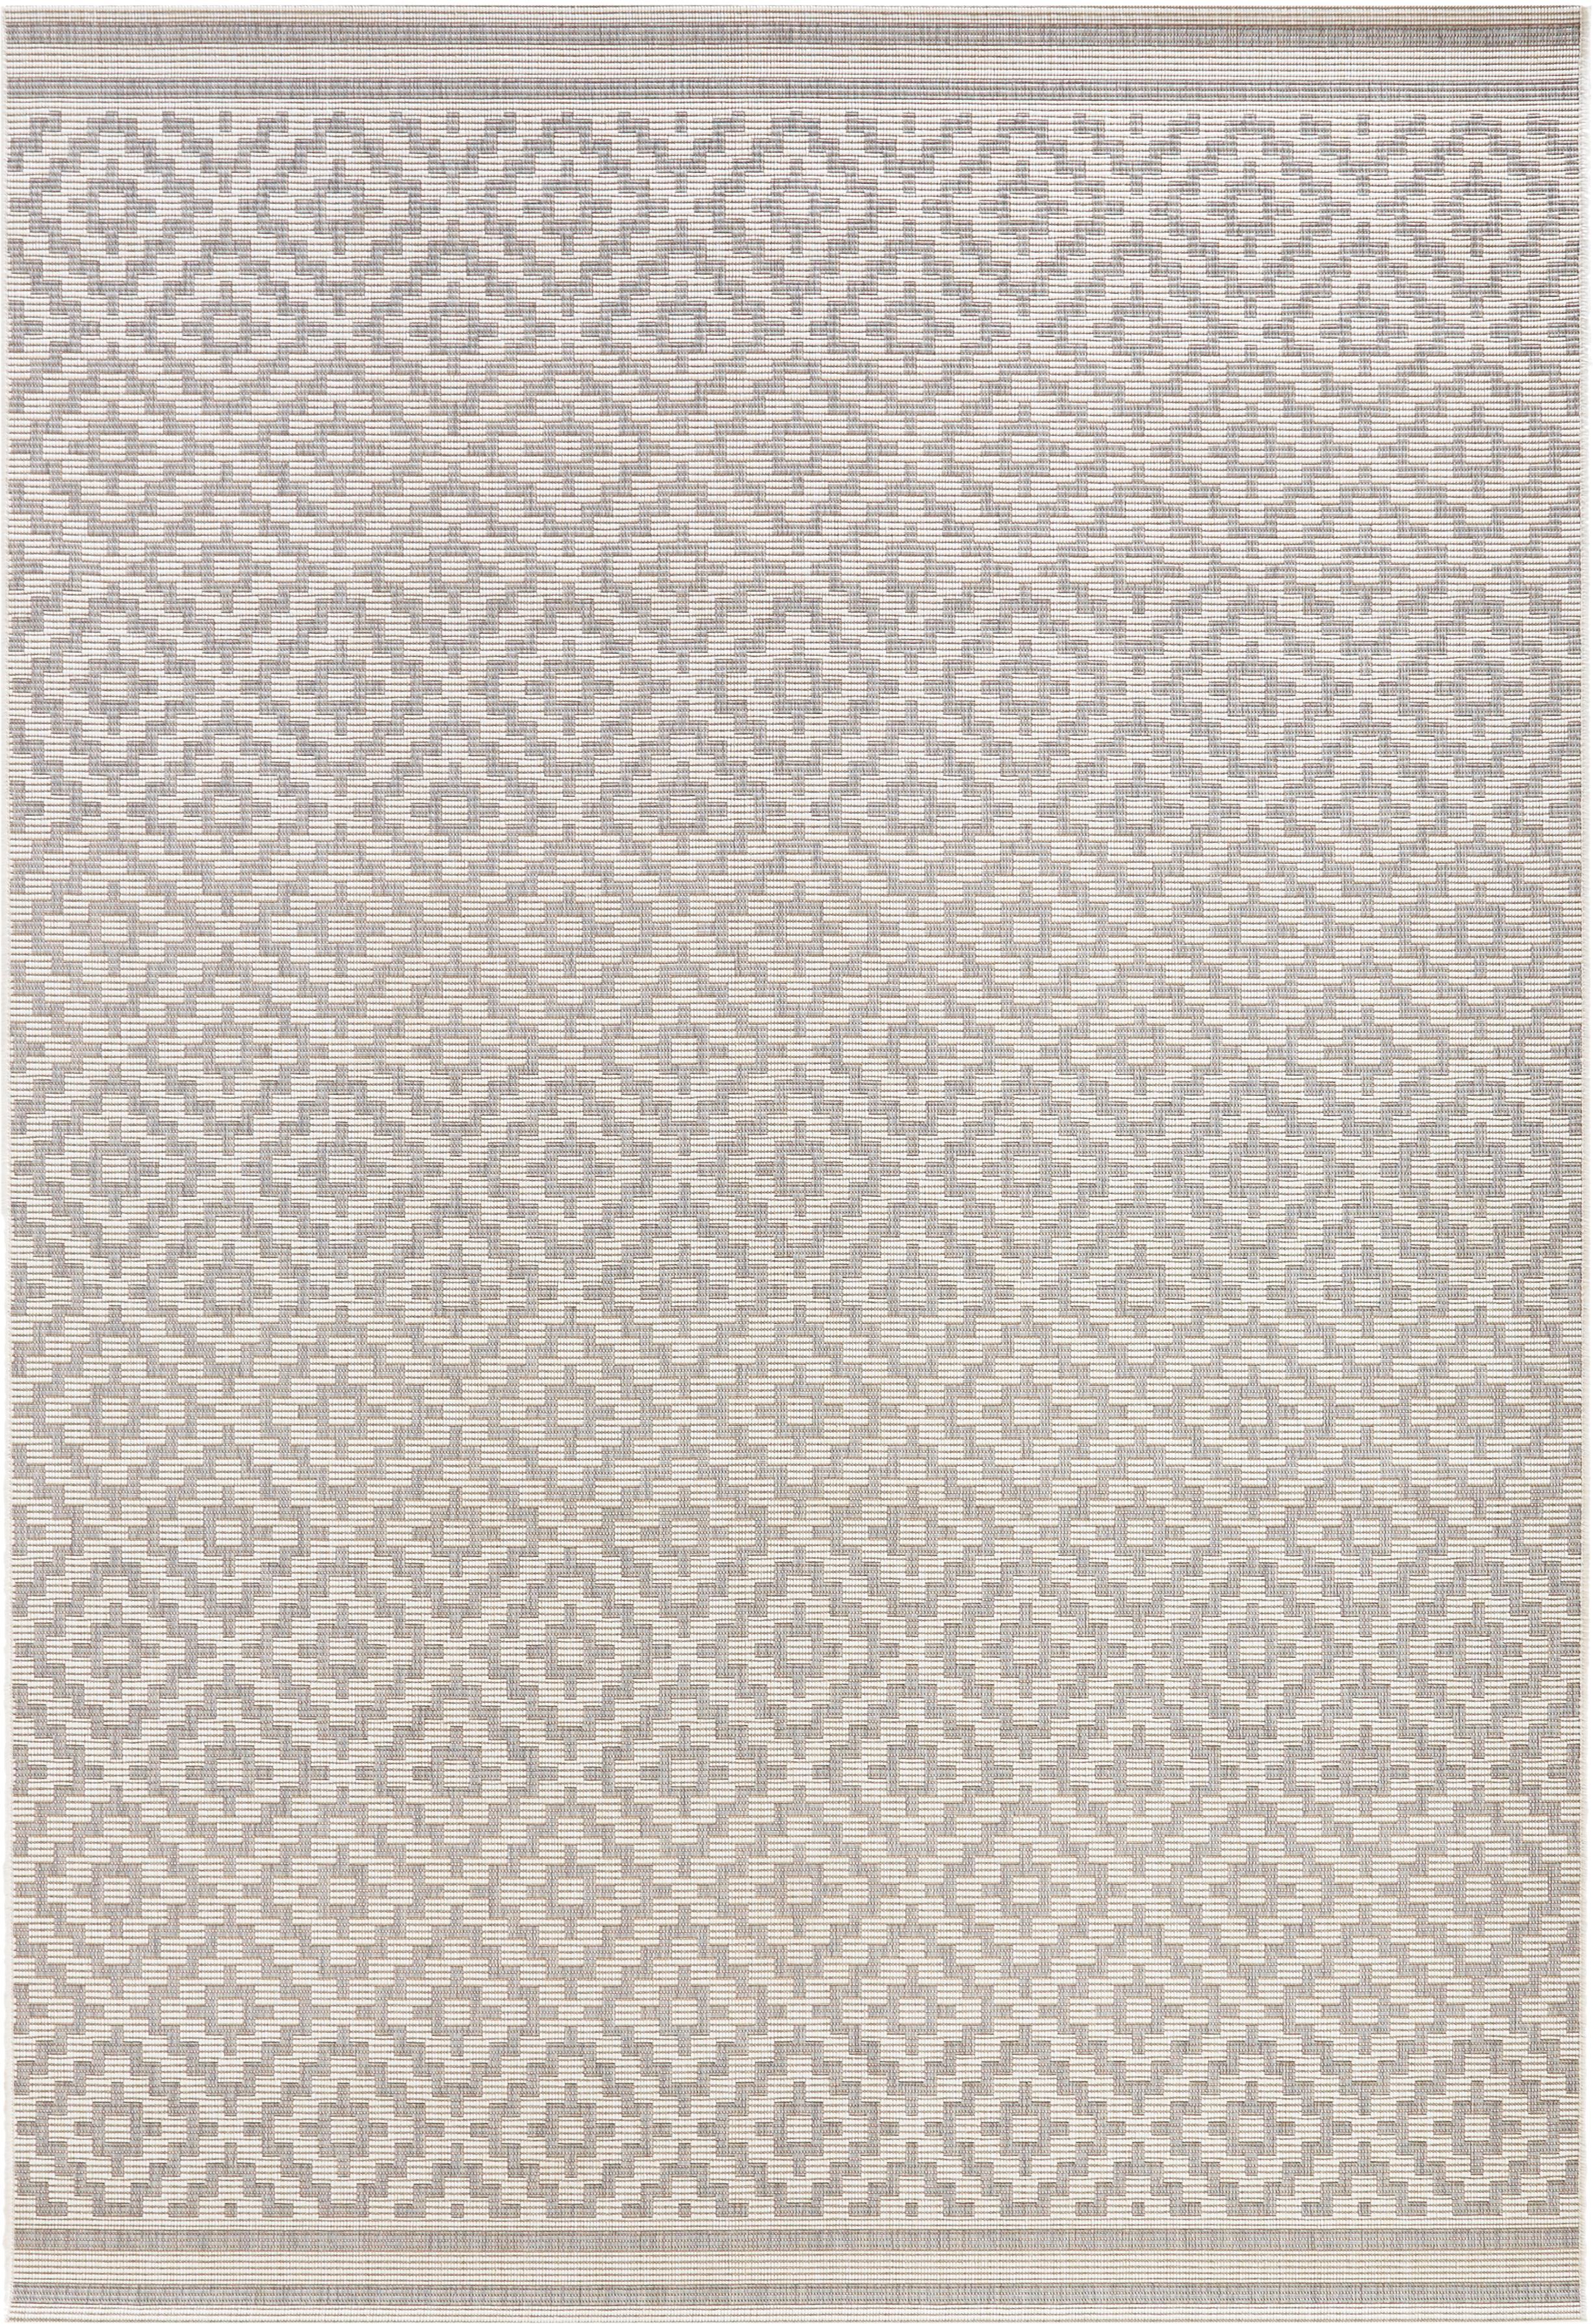 Alfombra de interior/exterior Meadow Raute, Gris, beige, An 140 x L 200 cm (Tamaño S)